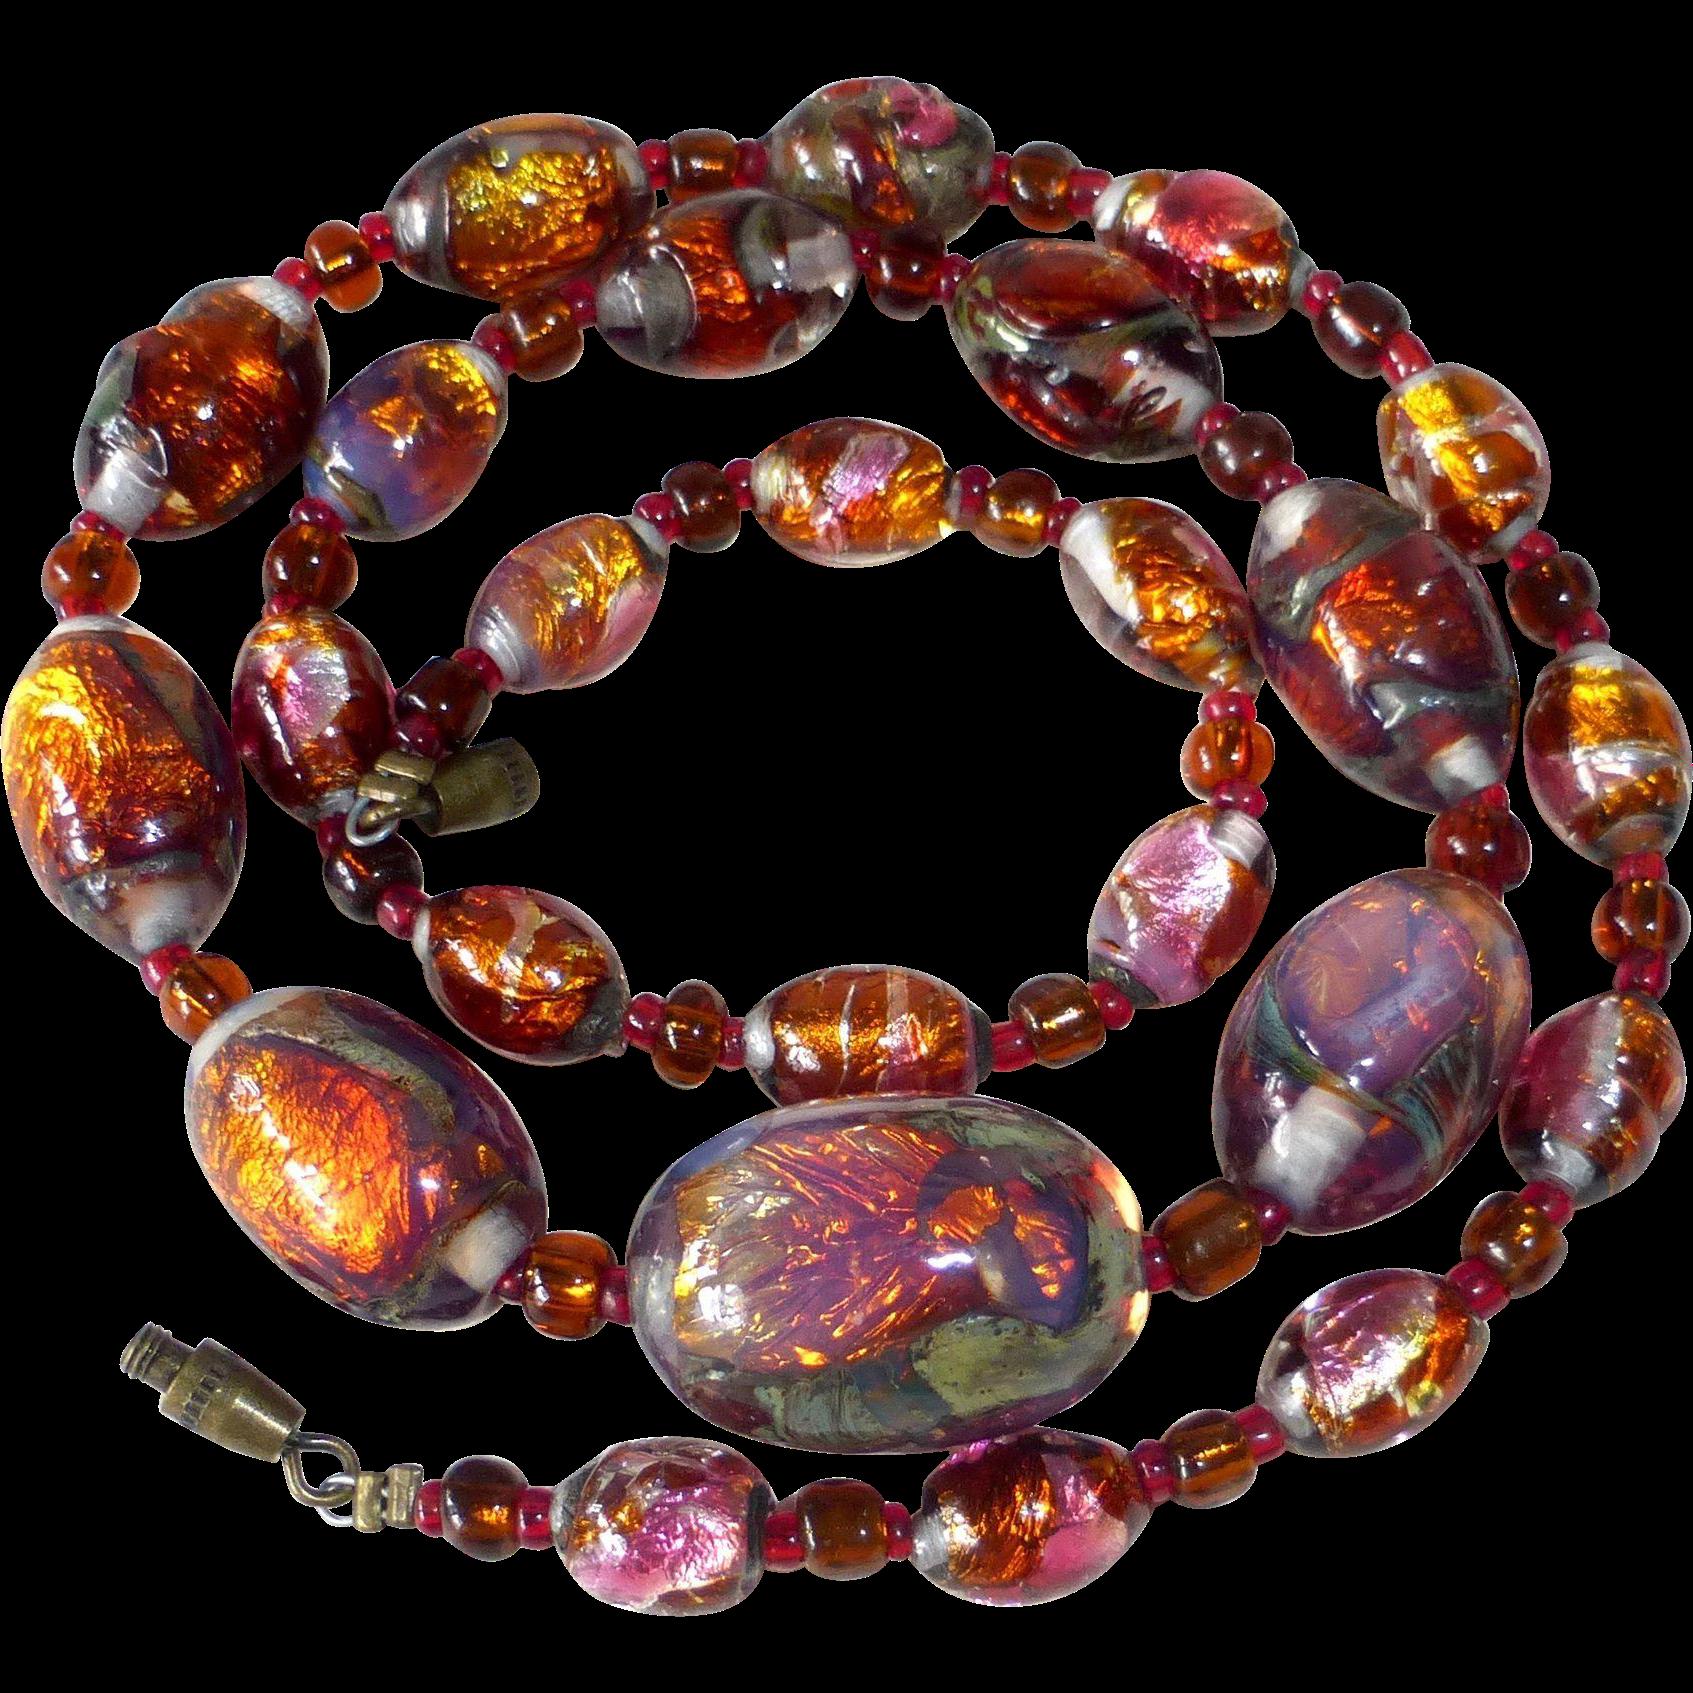 Rare 'Fire Opal' Art Deco Iridescent Foil Underglass Bead Necklace